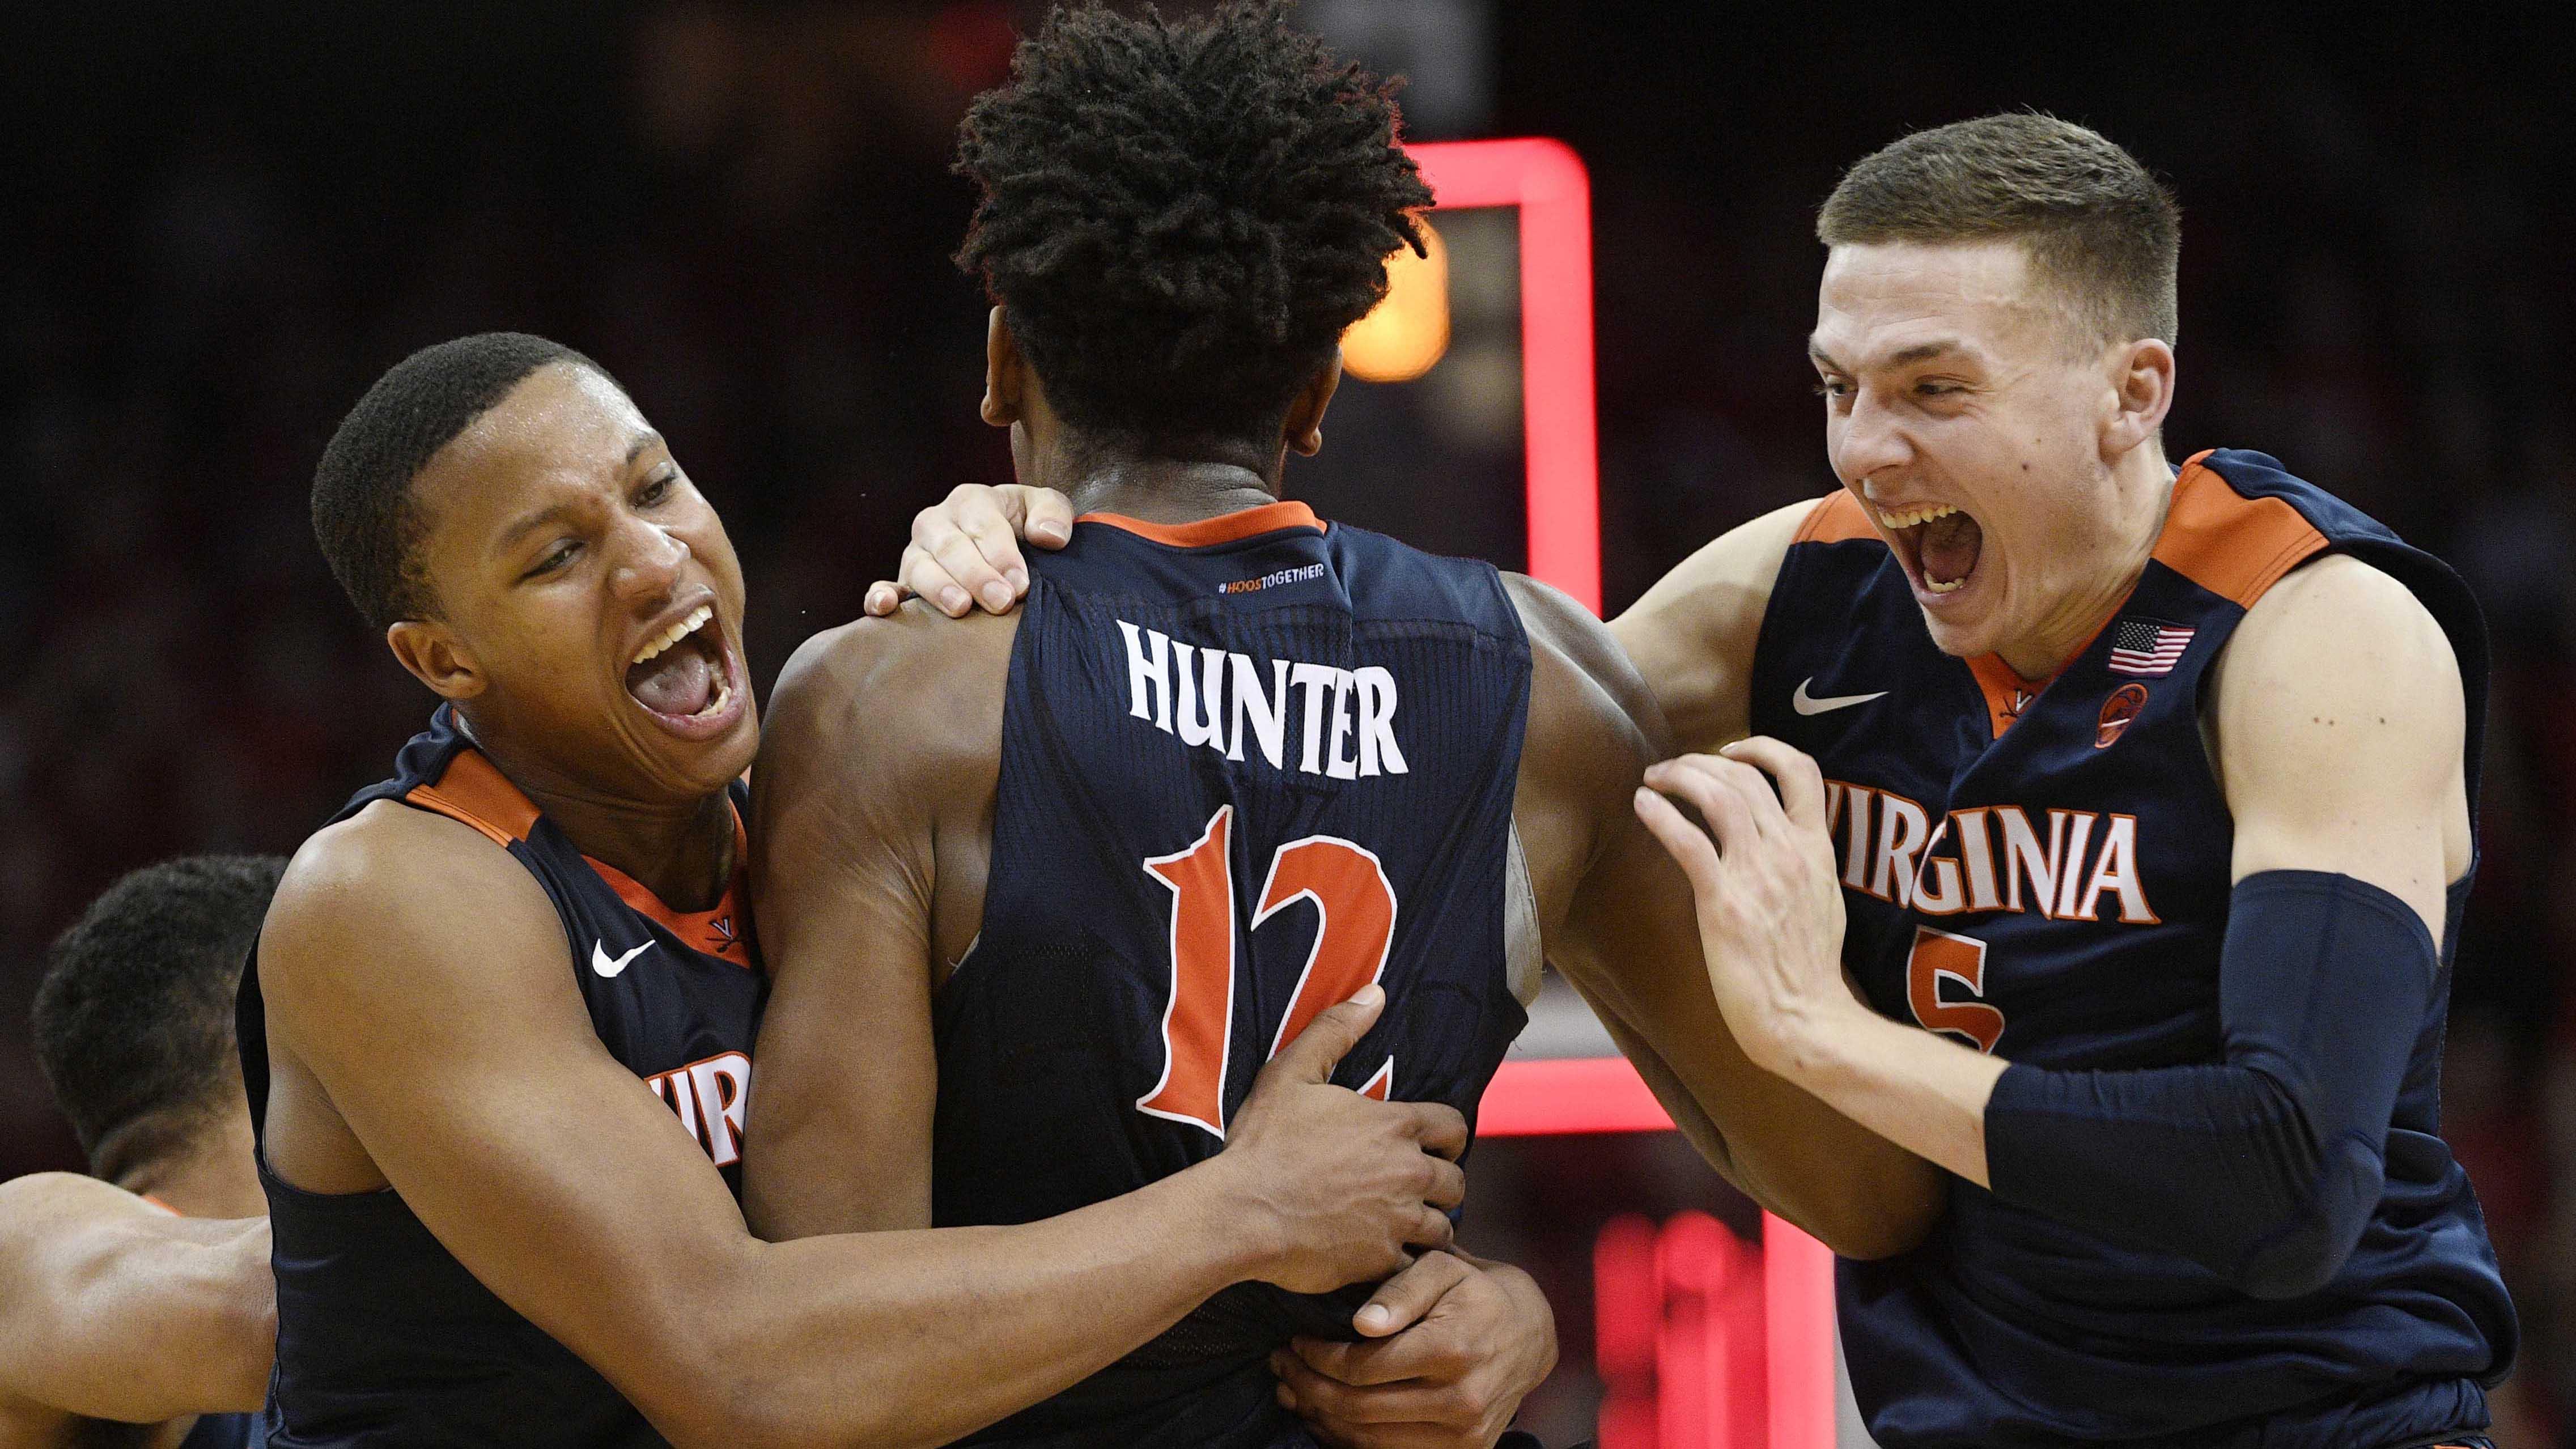 Virginia's De'Andre Hunter celebrates with teammates